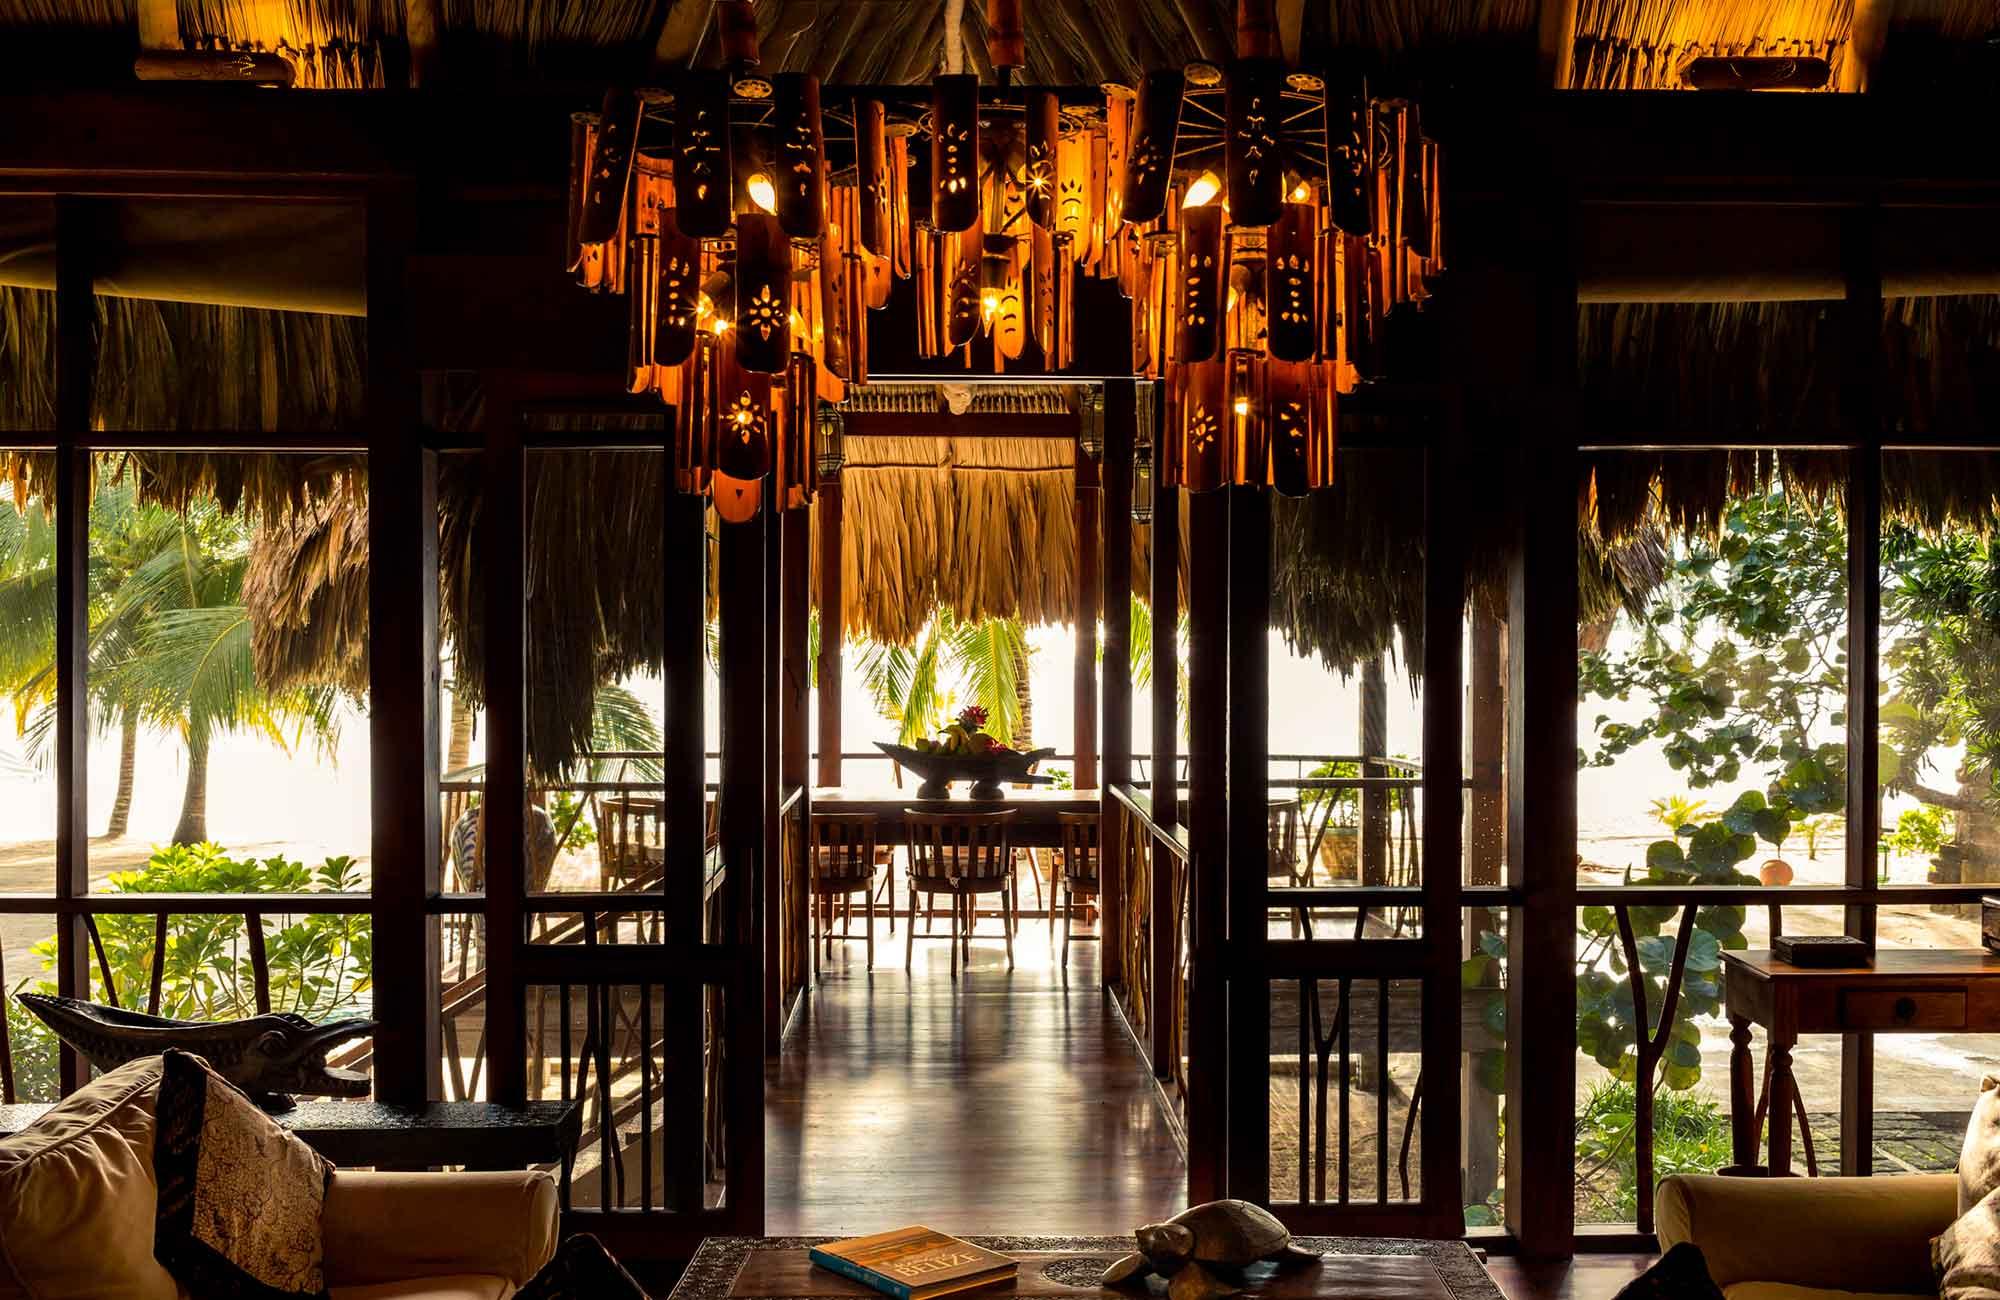 Séjour Belize - Turtle Inn Coppola Lodge - Amplitudes